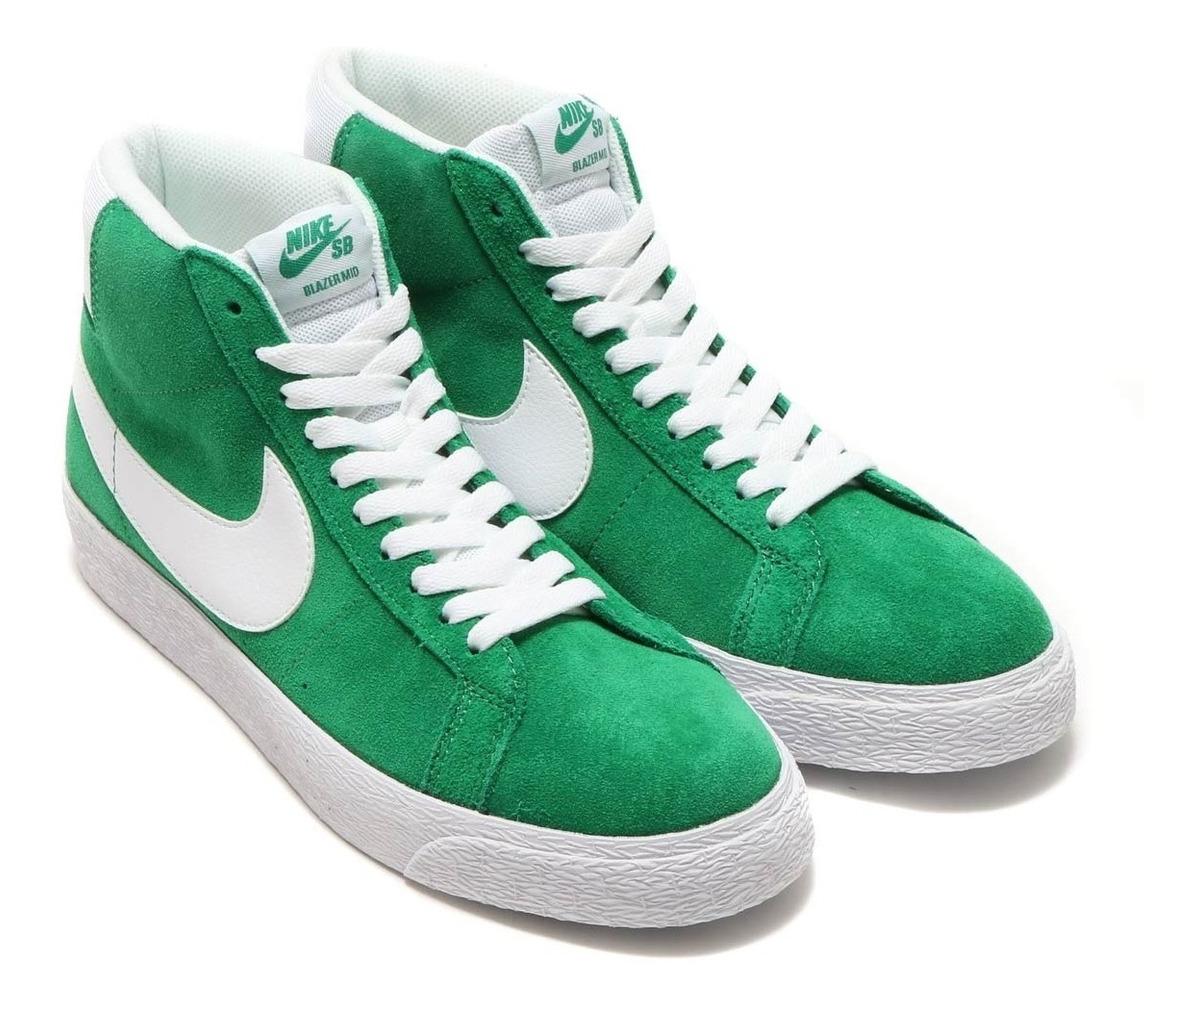 best service 8d88d 7dc66 Zapatillas Nike Sb Zoom Blazer Pine Green Hombre Mujer 311